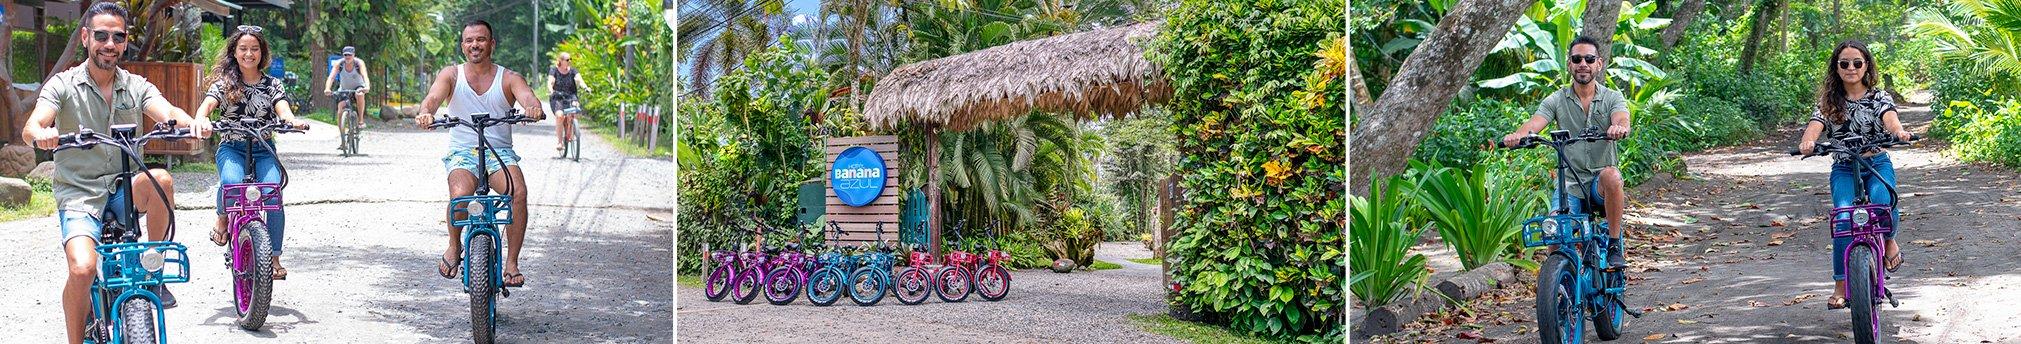 E-bike Beach Discovery Tour